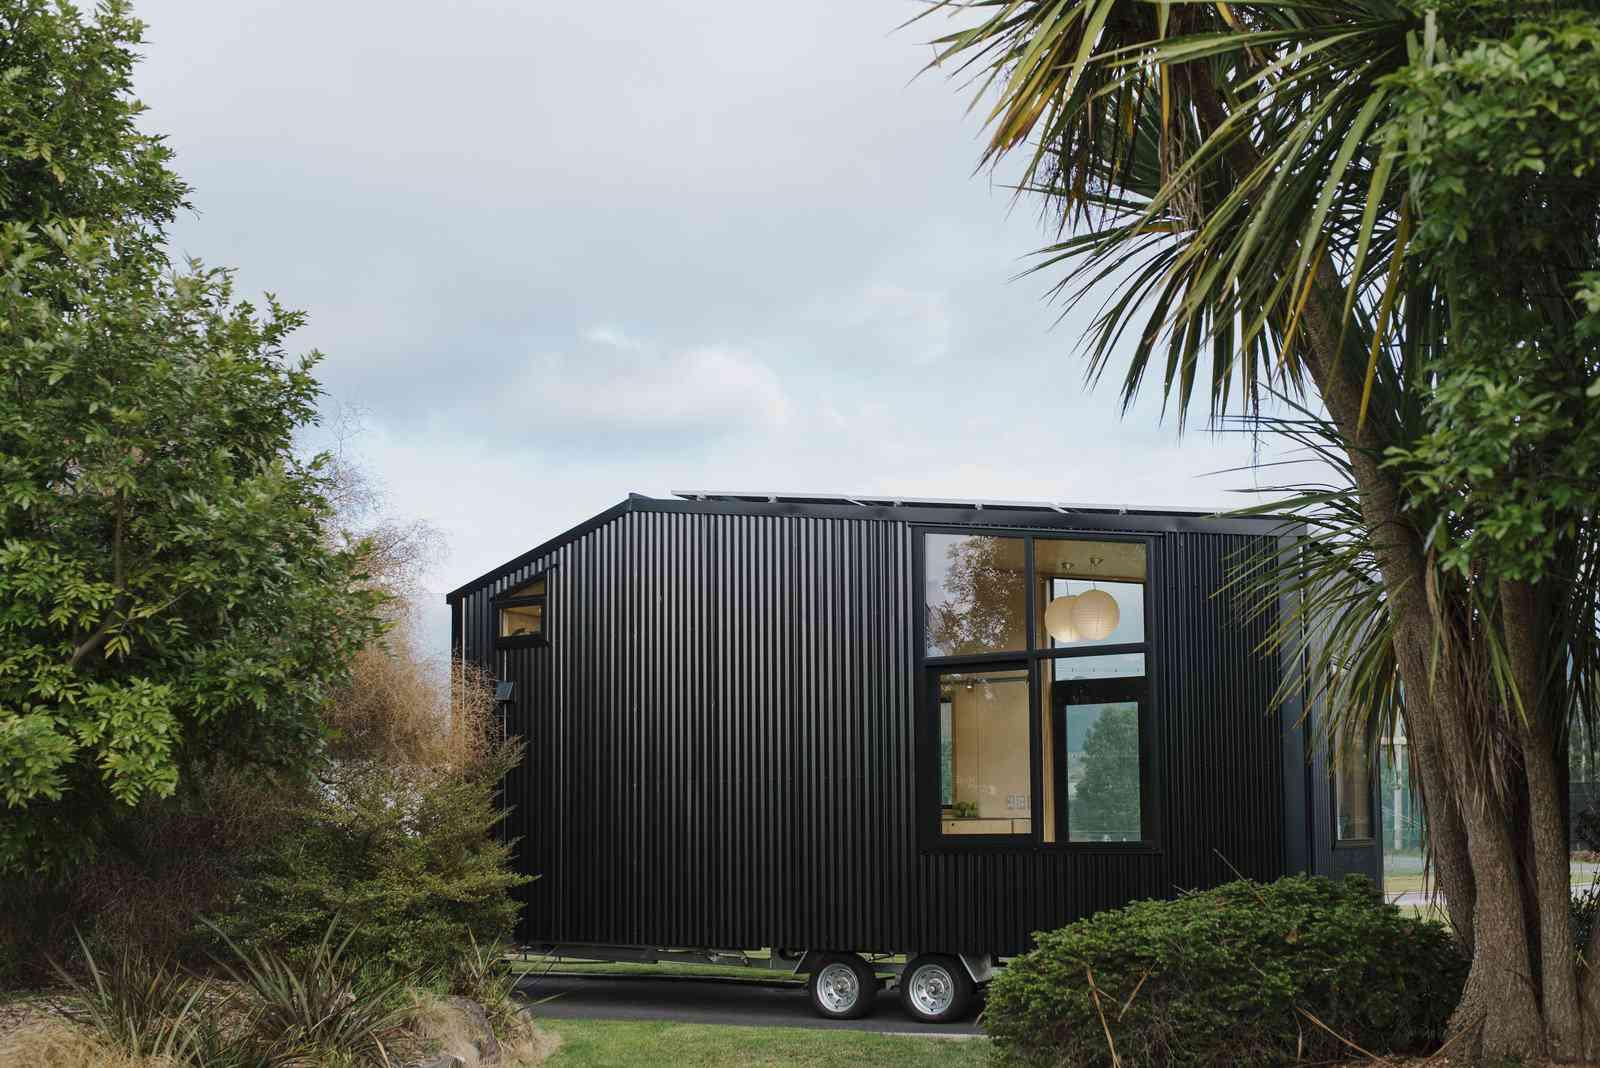 Ohariu tiny house by First Light Studio and Build Tiny exterior